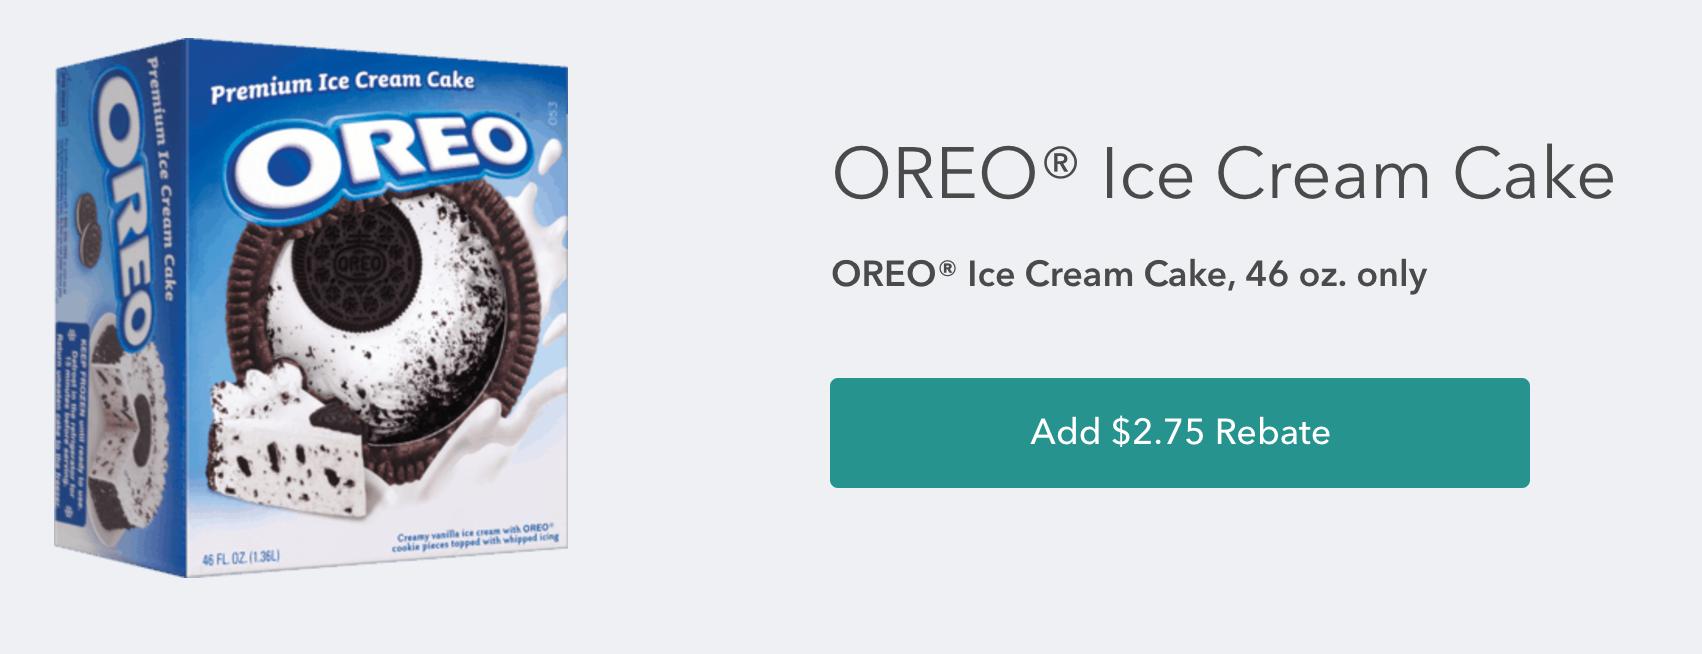 Coupon For Oreo Ice Cream Cake